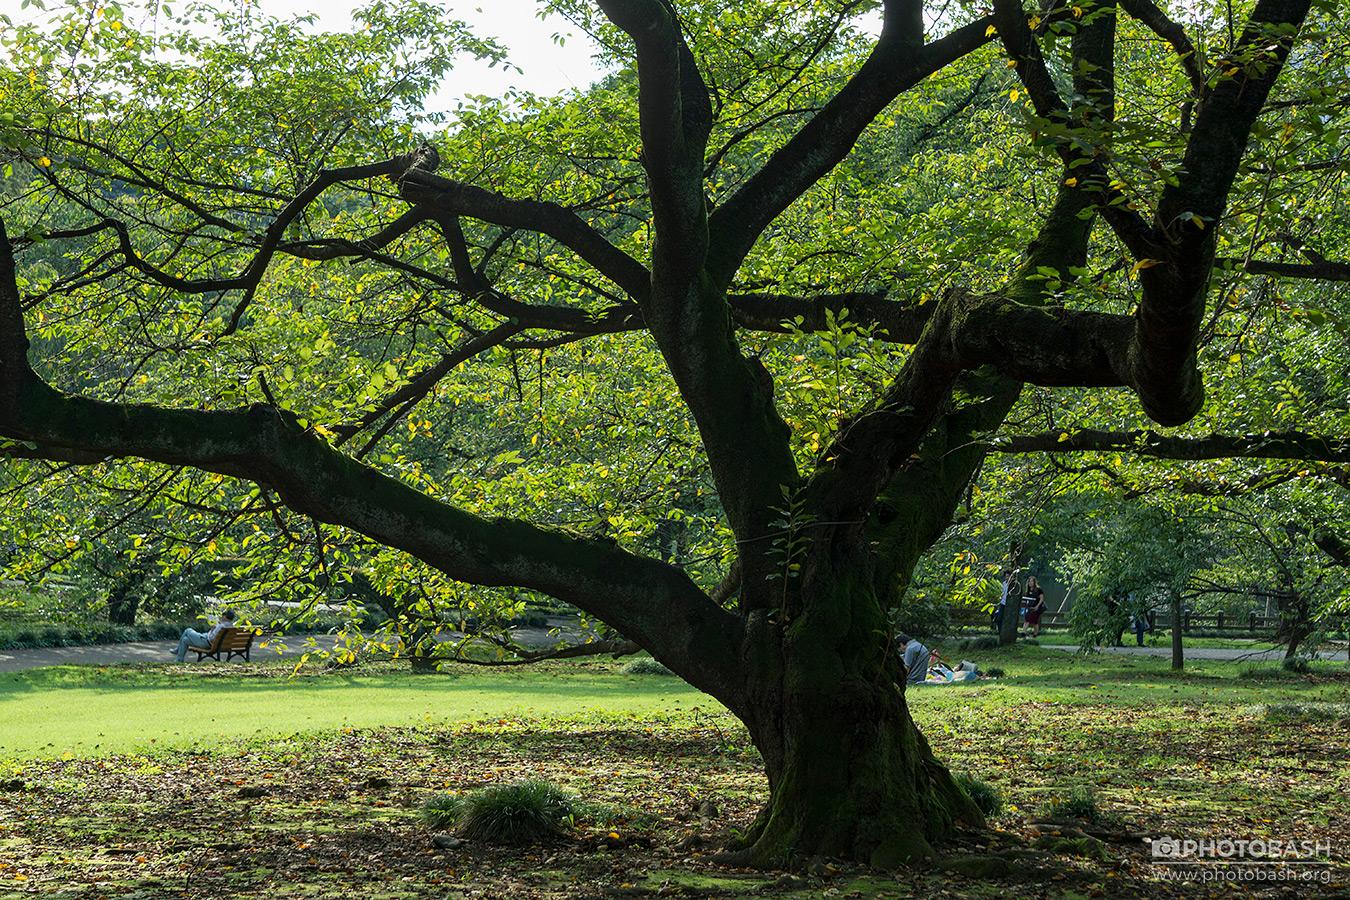 Parks-Gardens-Tree-Trunk-Silhouette.jpg